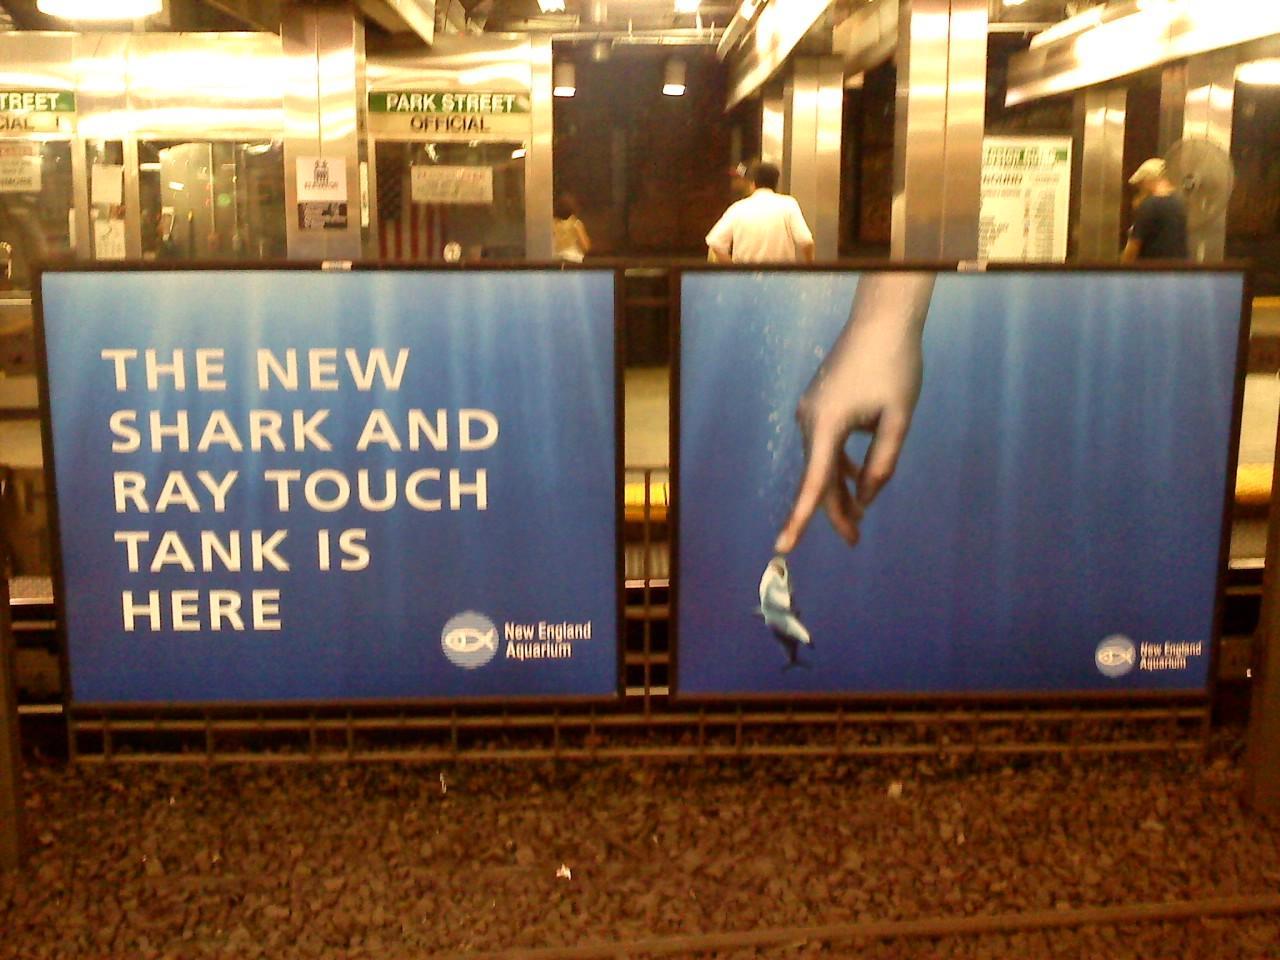 MBTA to Pilot Digital Advertising Displays in Four T Stations